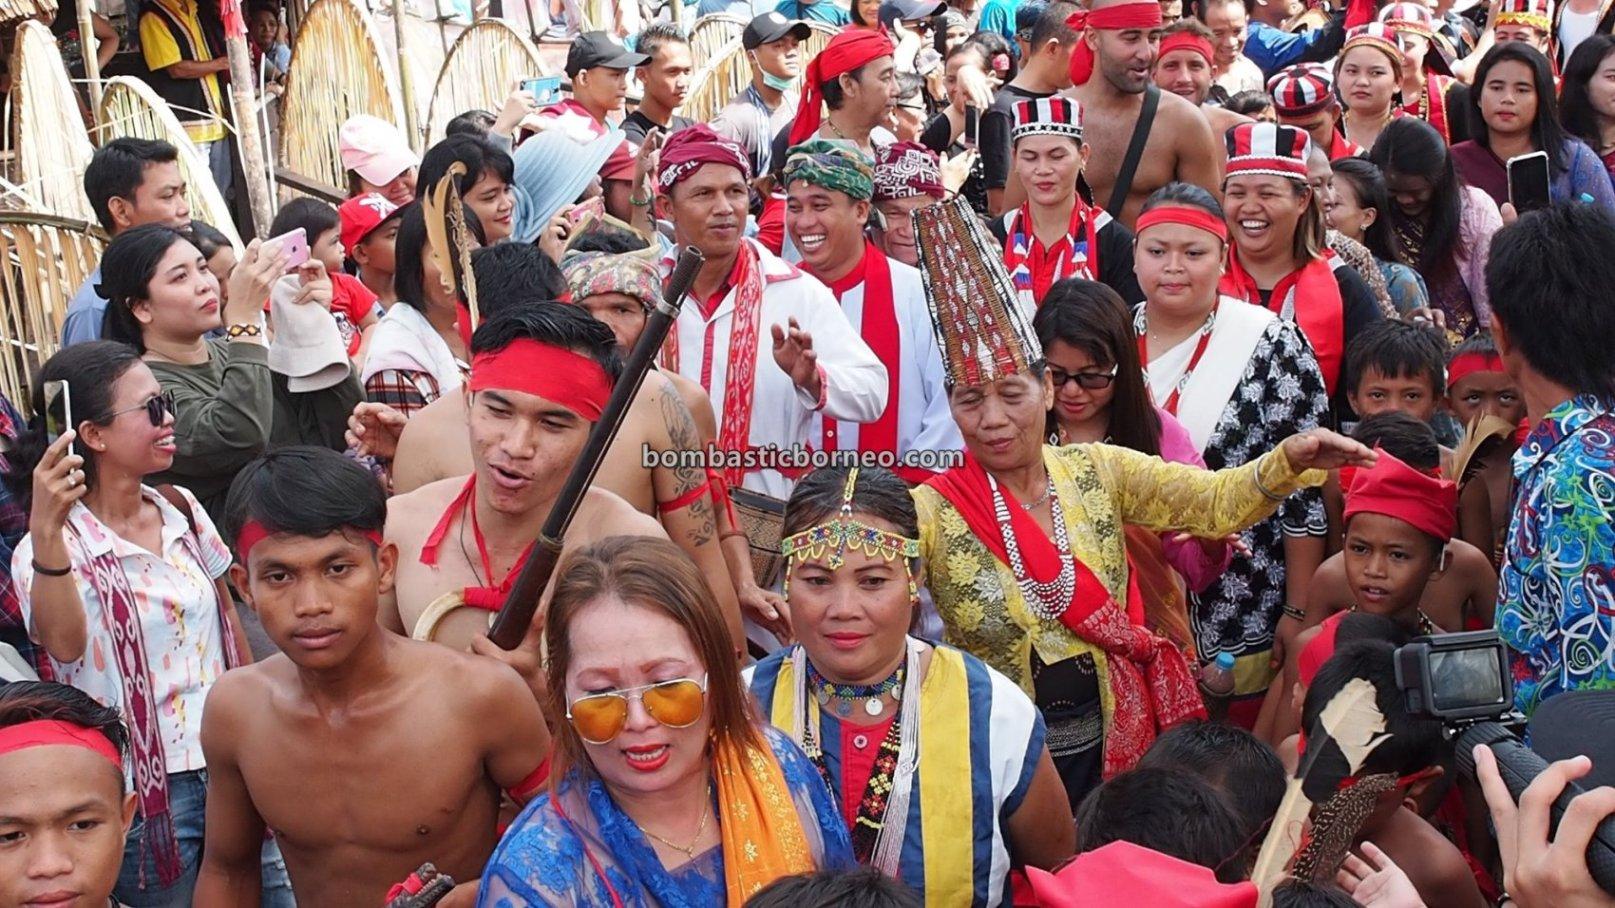 Harvest Festival, traditional, Bengkayang, Kalimantan Barat, Siding, Indigenous, native, tribal, wisata budaya, Tourism, travel guide, Trans Border, Borneo, 印尼西加里曼丹, 原住民传统丰收节. 婆罗洲比达友部落